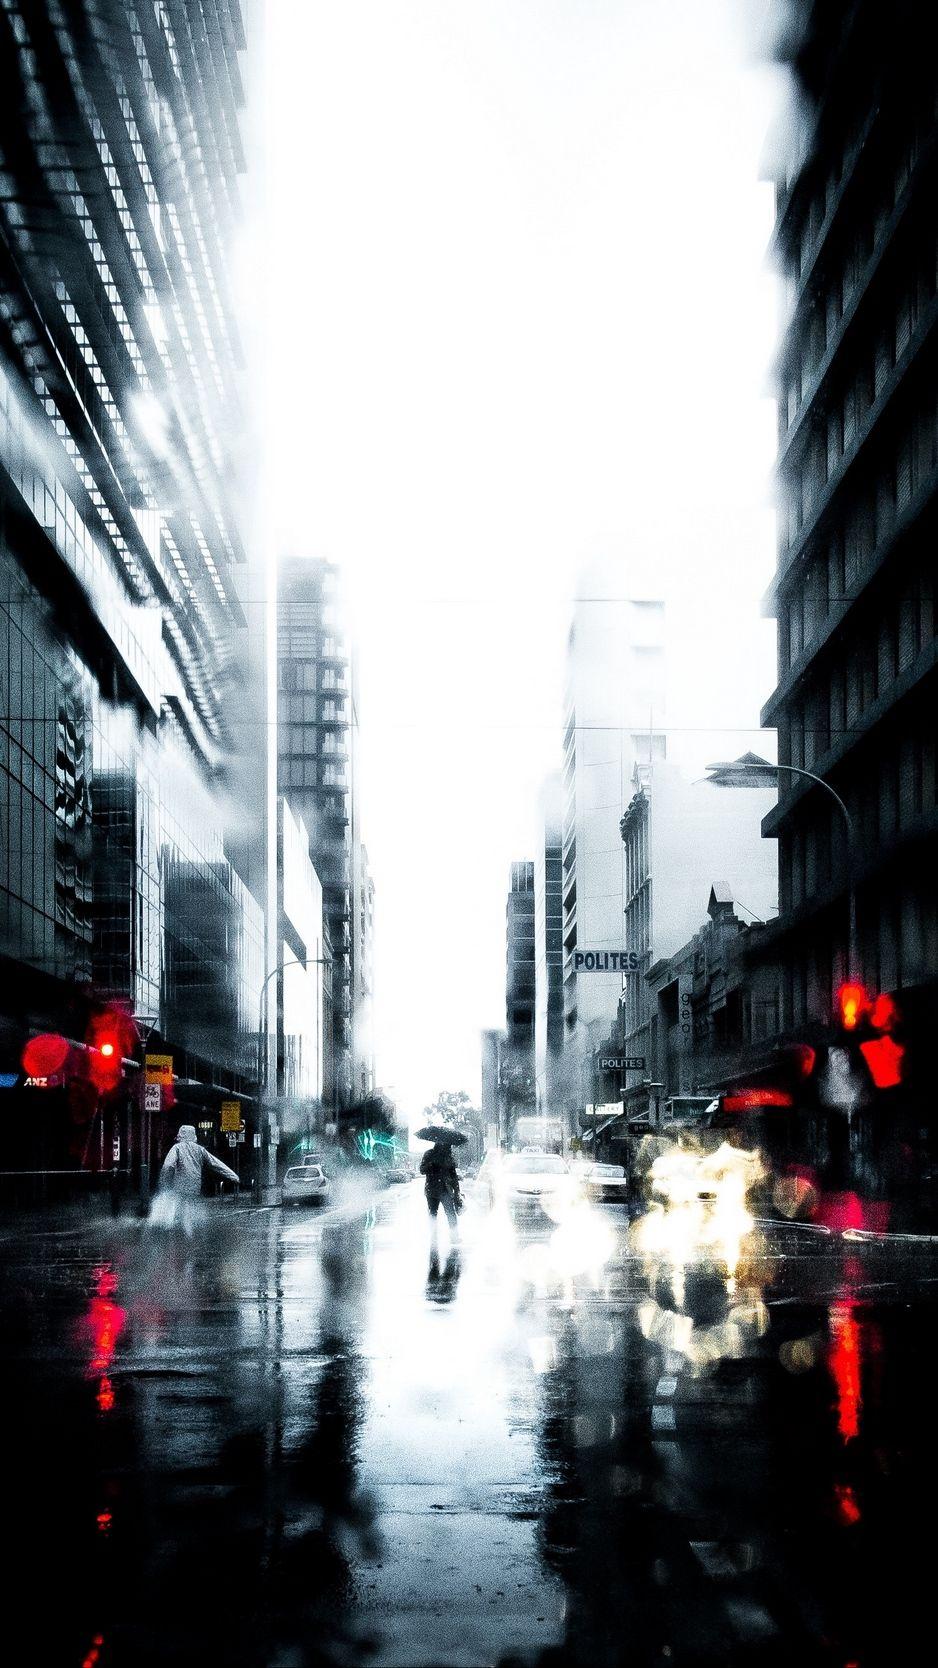 Silhouette Rain Loneliness City Wallpaper Background City Wallpaper Background City Lights Wallpaper